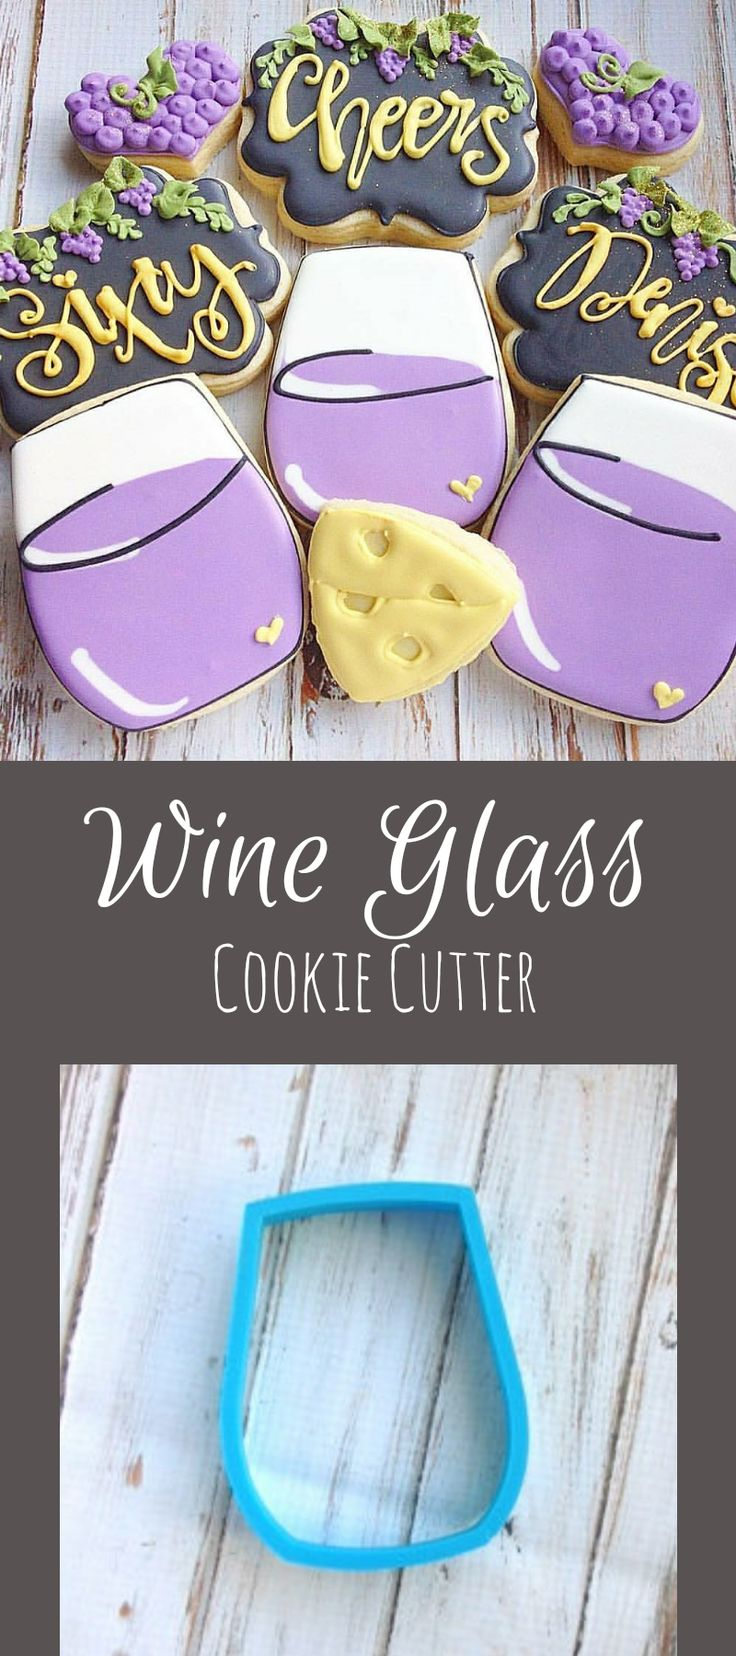 Stemless wine glass Cookie Cutter #affiliate